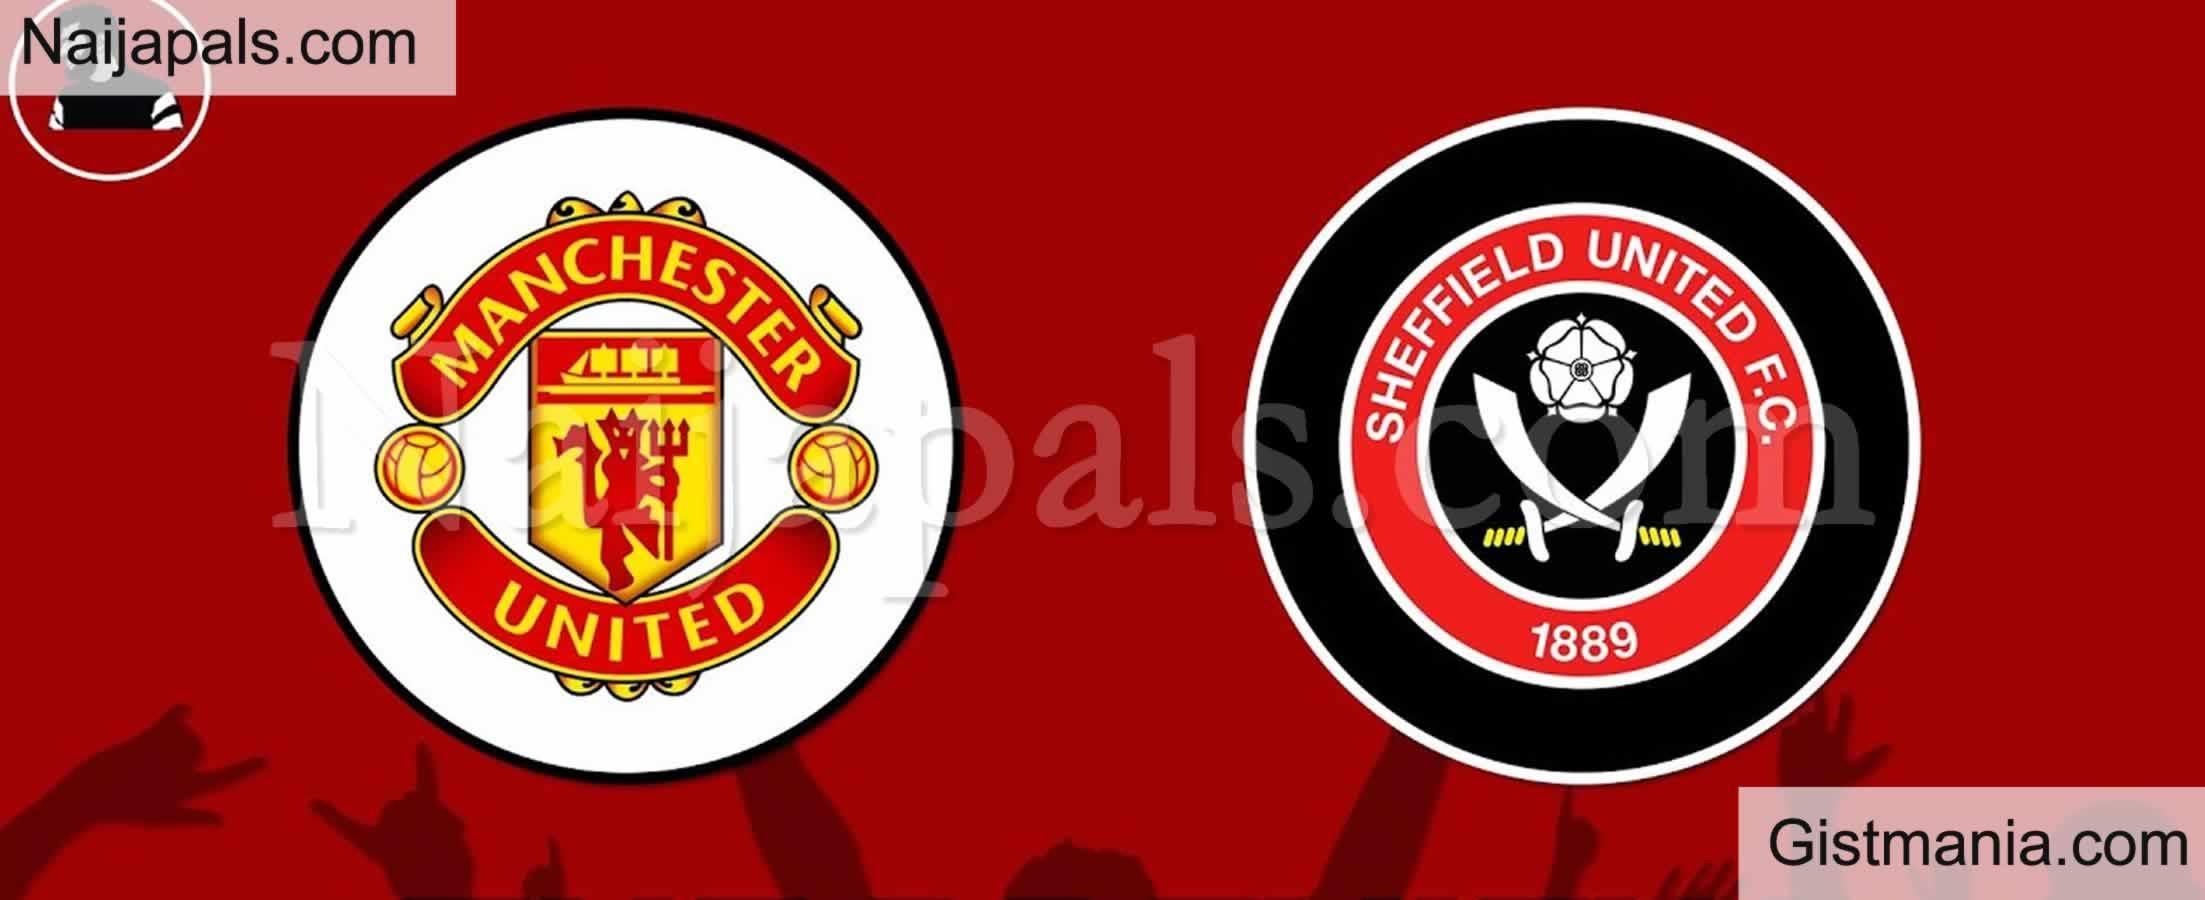 man united vs sheffield united - photo #48